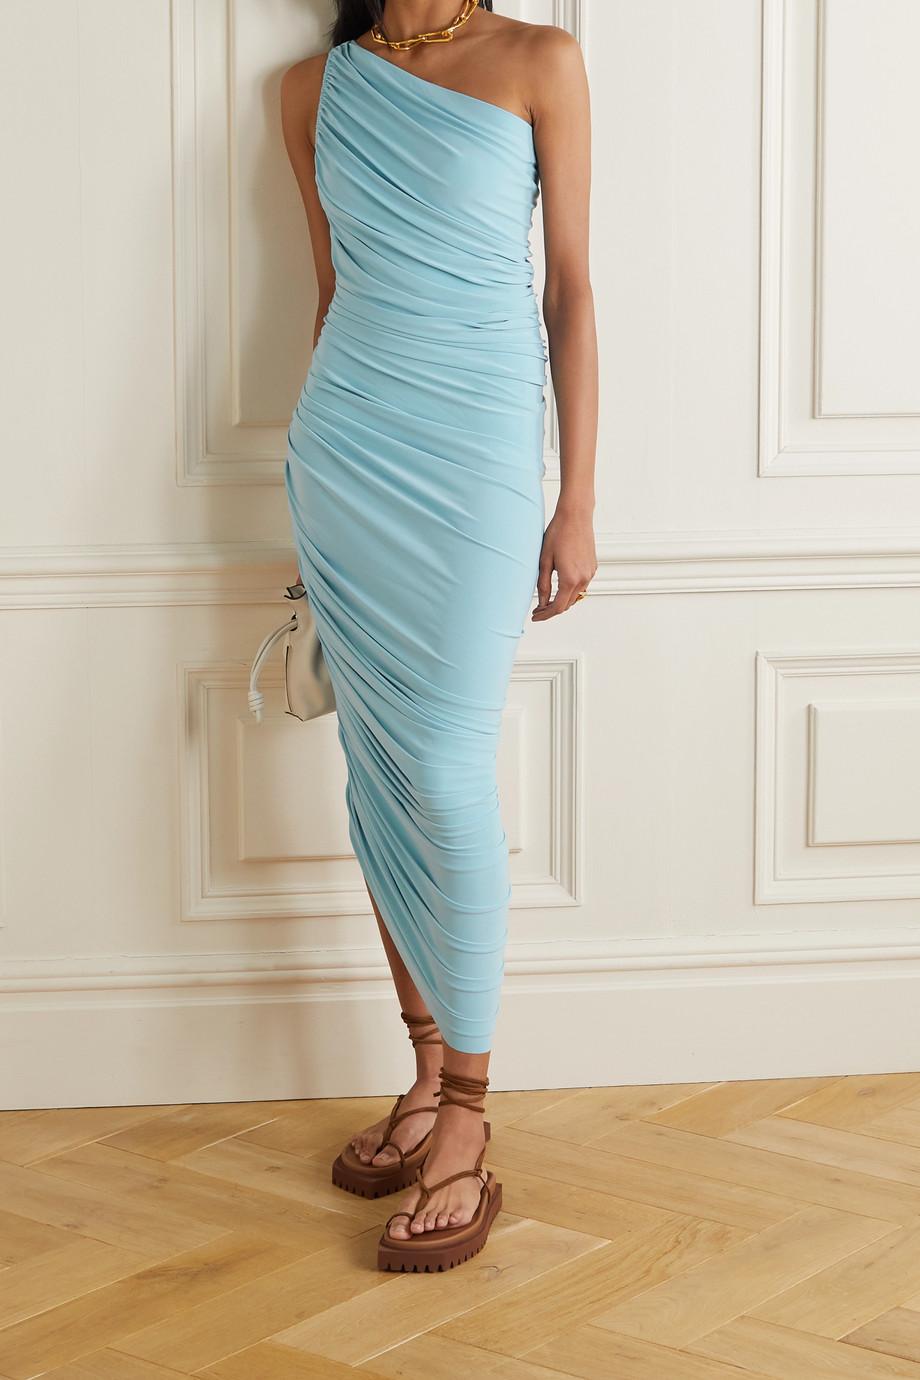 Norma Kamali Diana one-shoulder ruched stretch-jersey dress